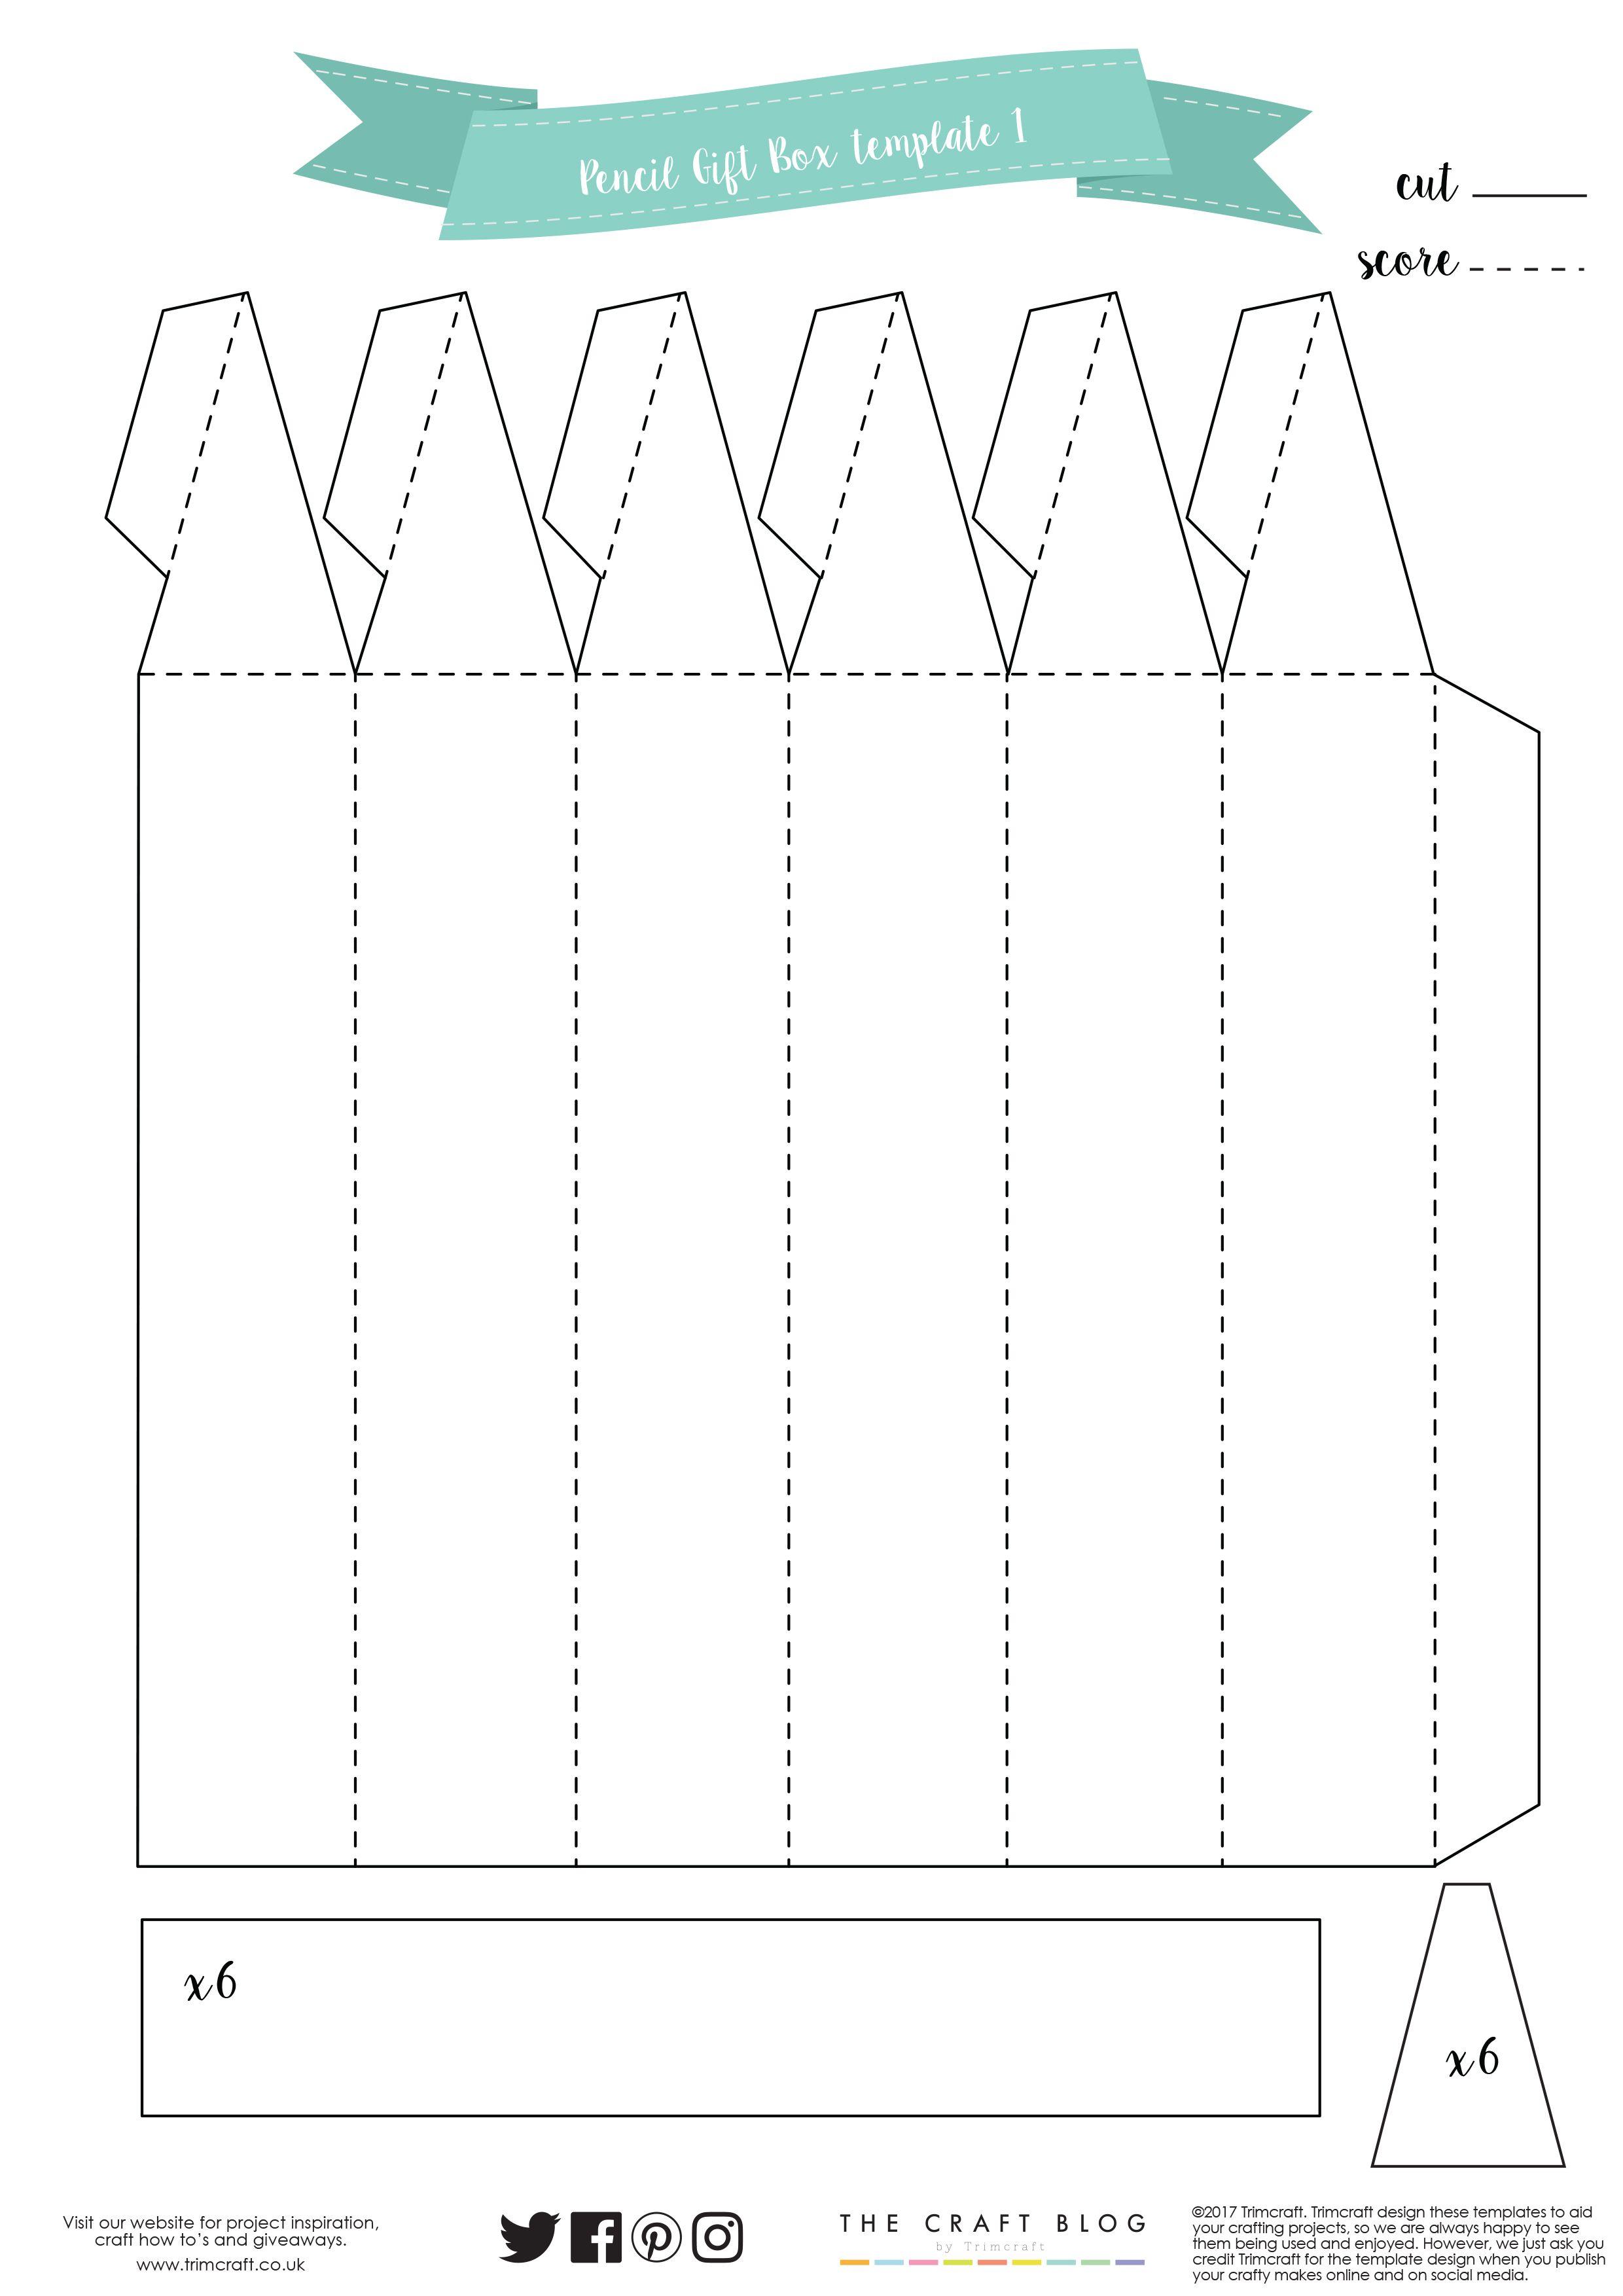 Pencil Gift Box Template | Поделки | Pinterest | Gift box templates ...